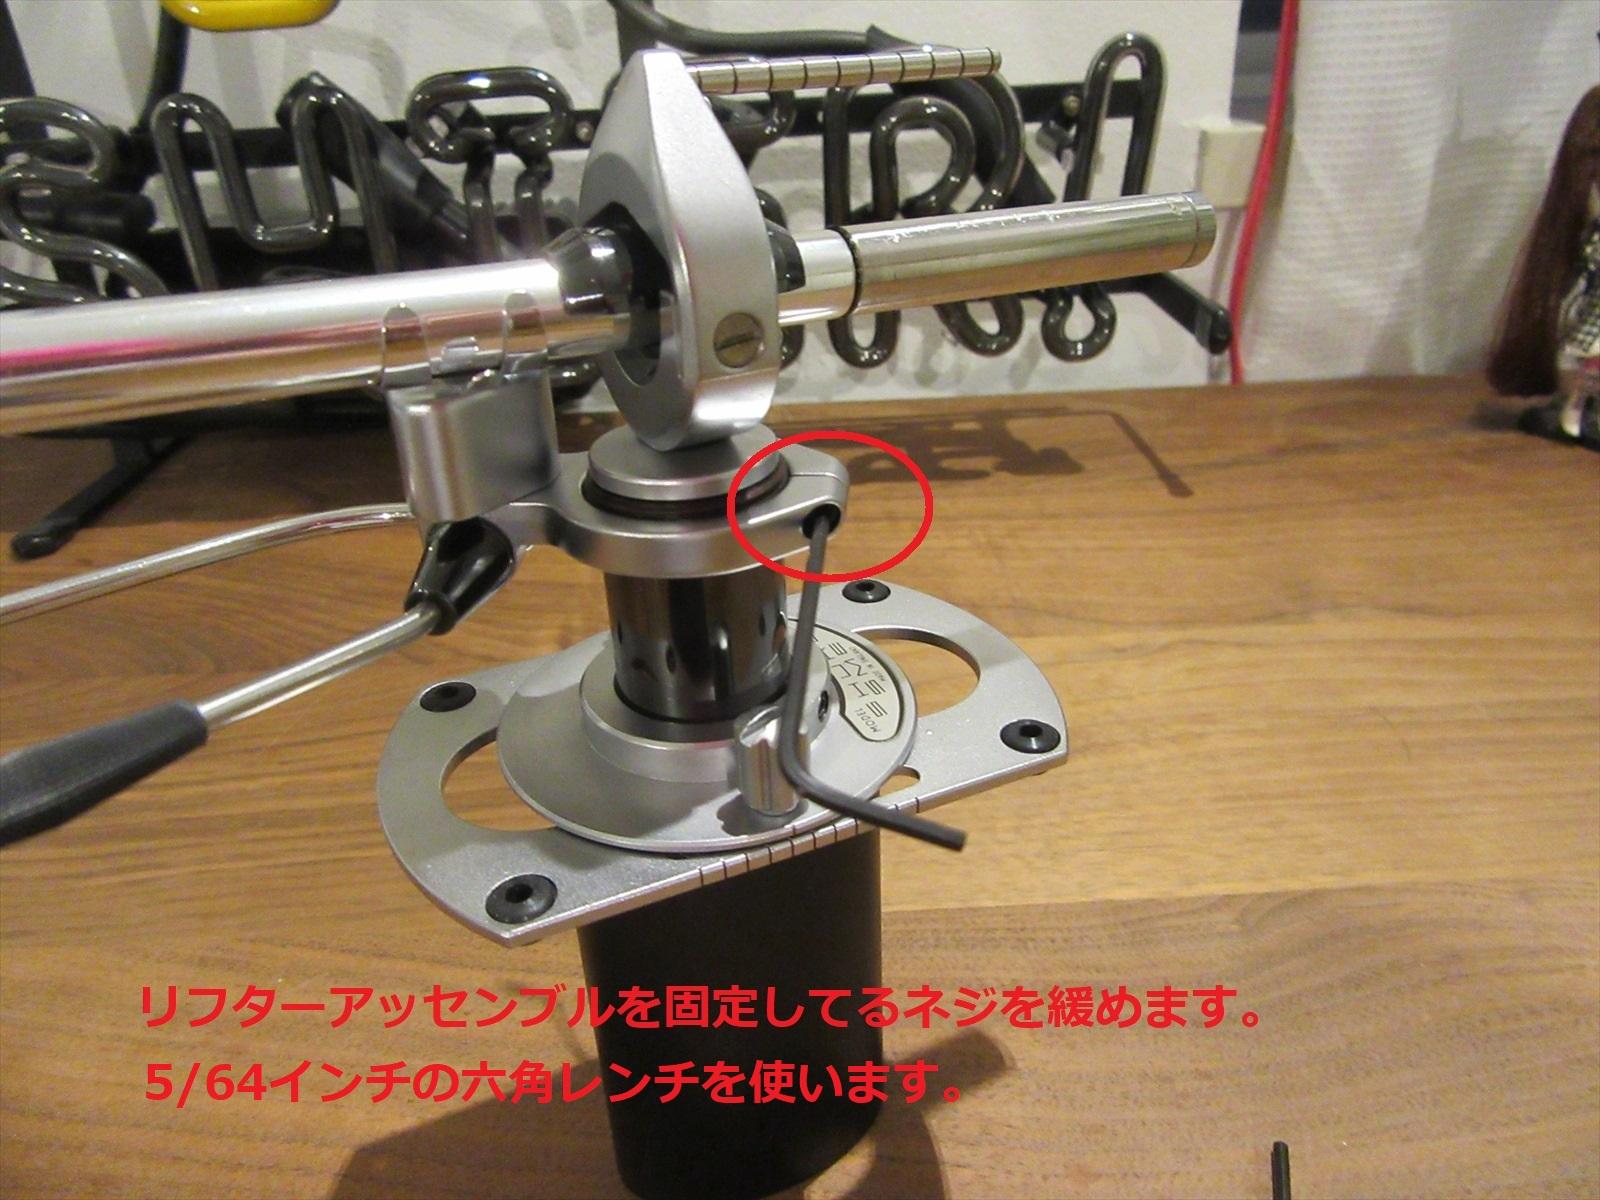 SME3009/3012S2・Rアームリフター高調整